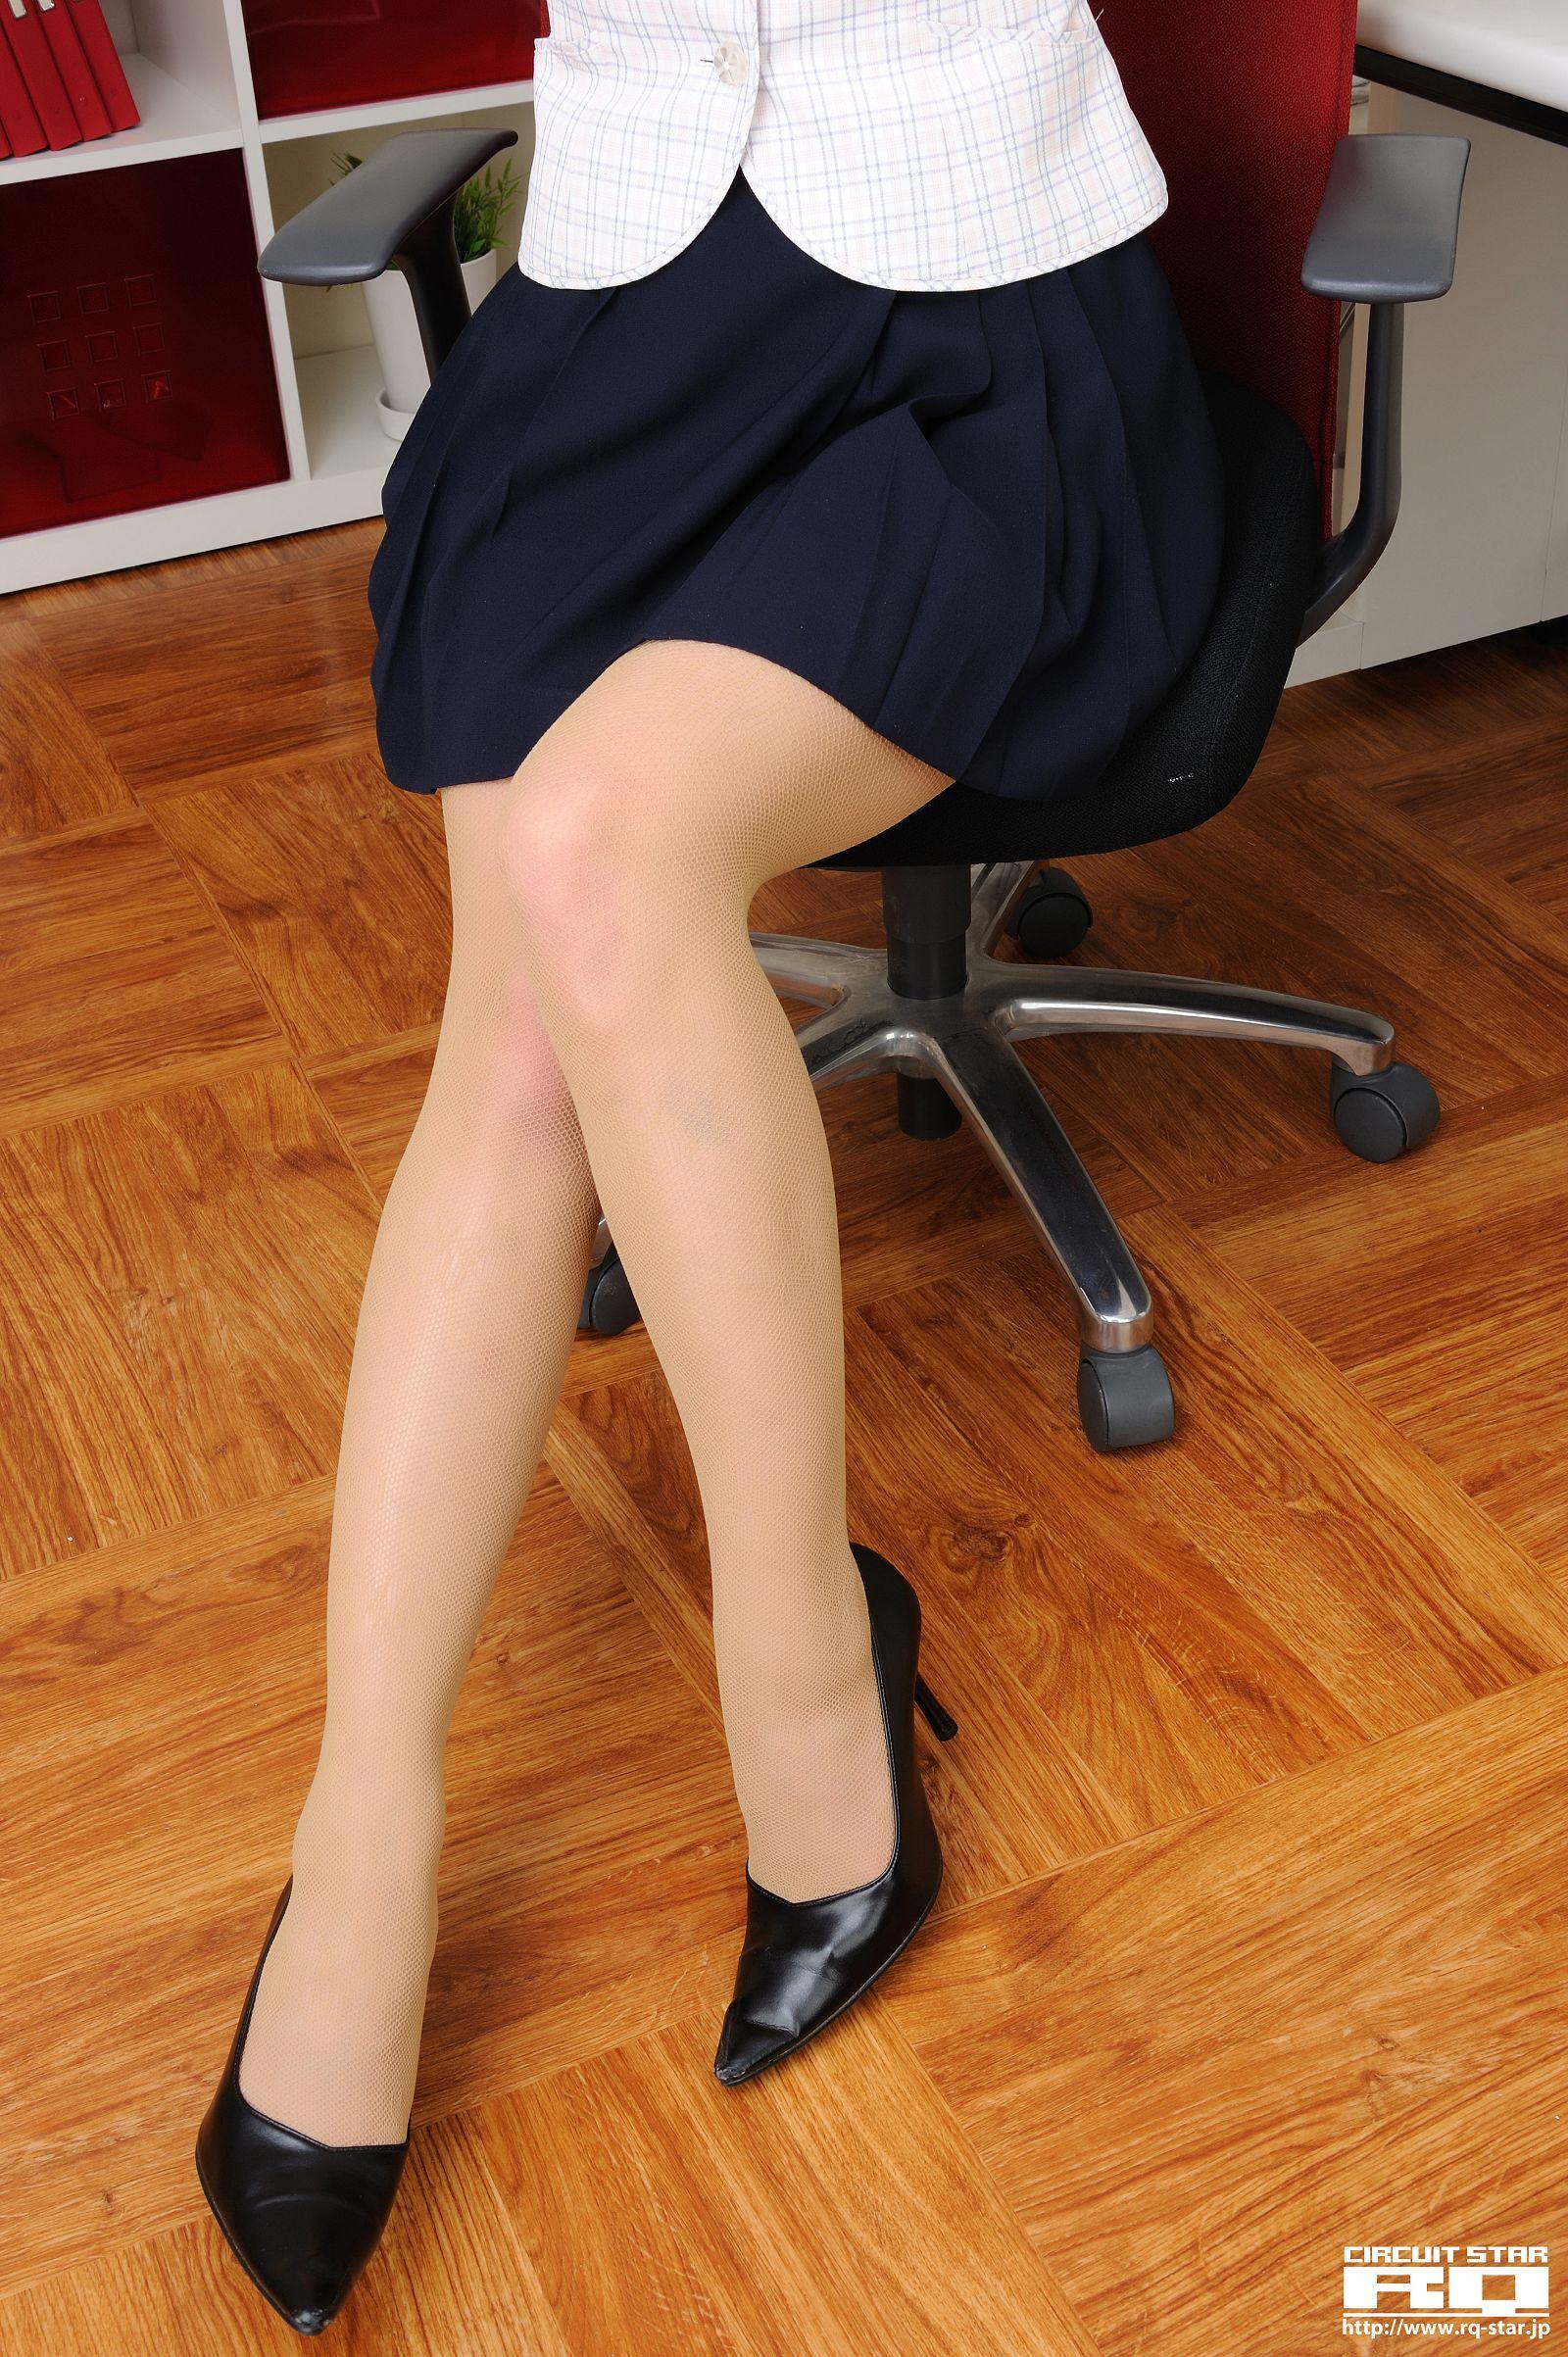 [RQ STAR美女] NO.00469 Megumi Haruna 春菜めぐみ Office Lady[96P] RQ STAR 第3张